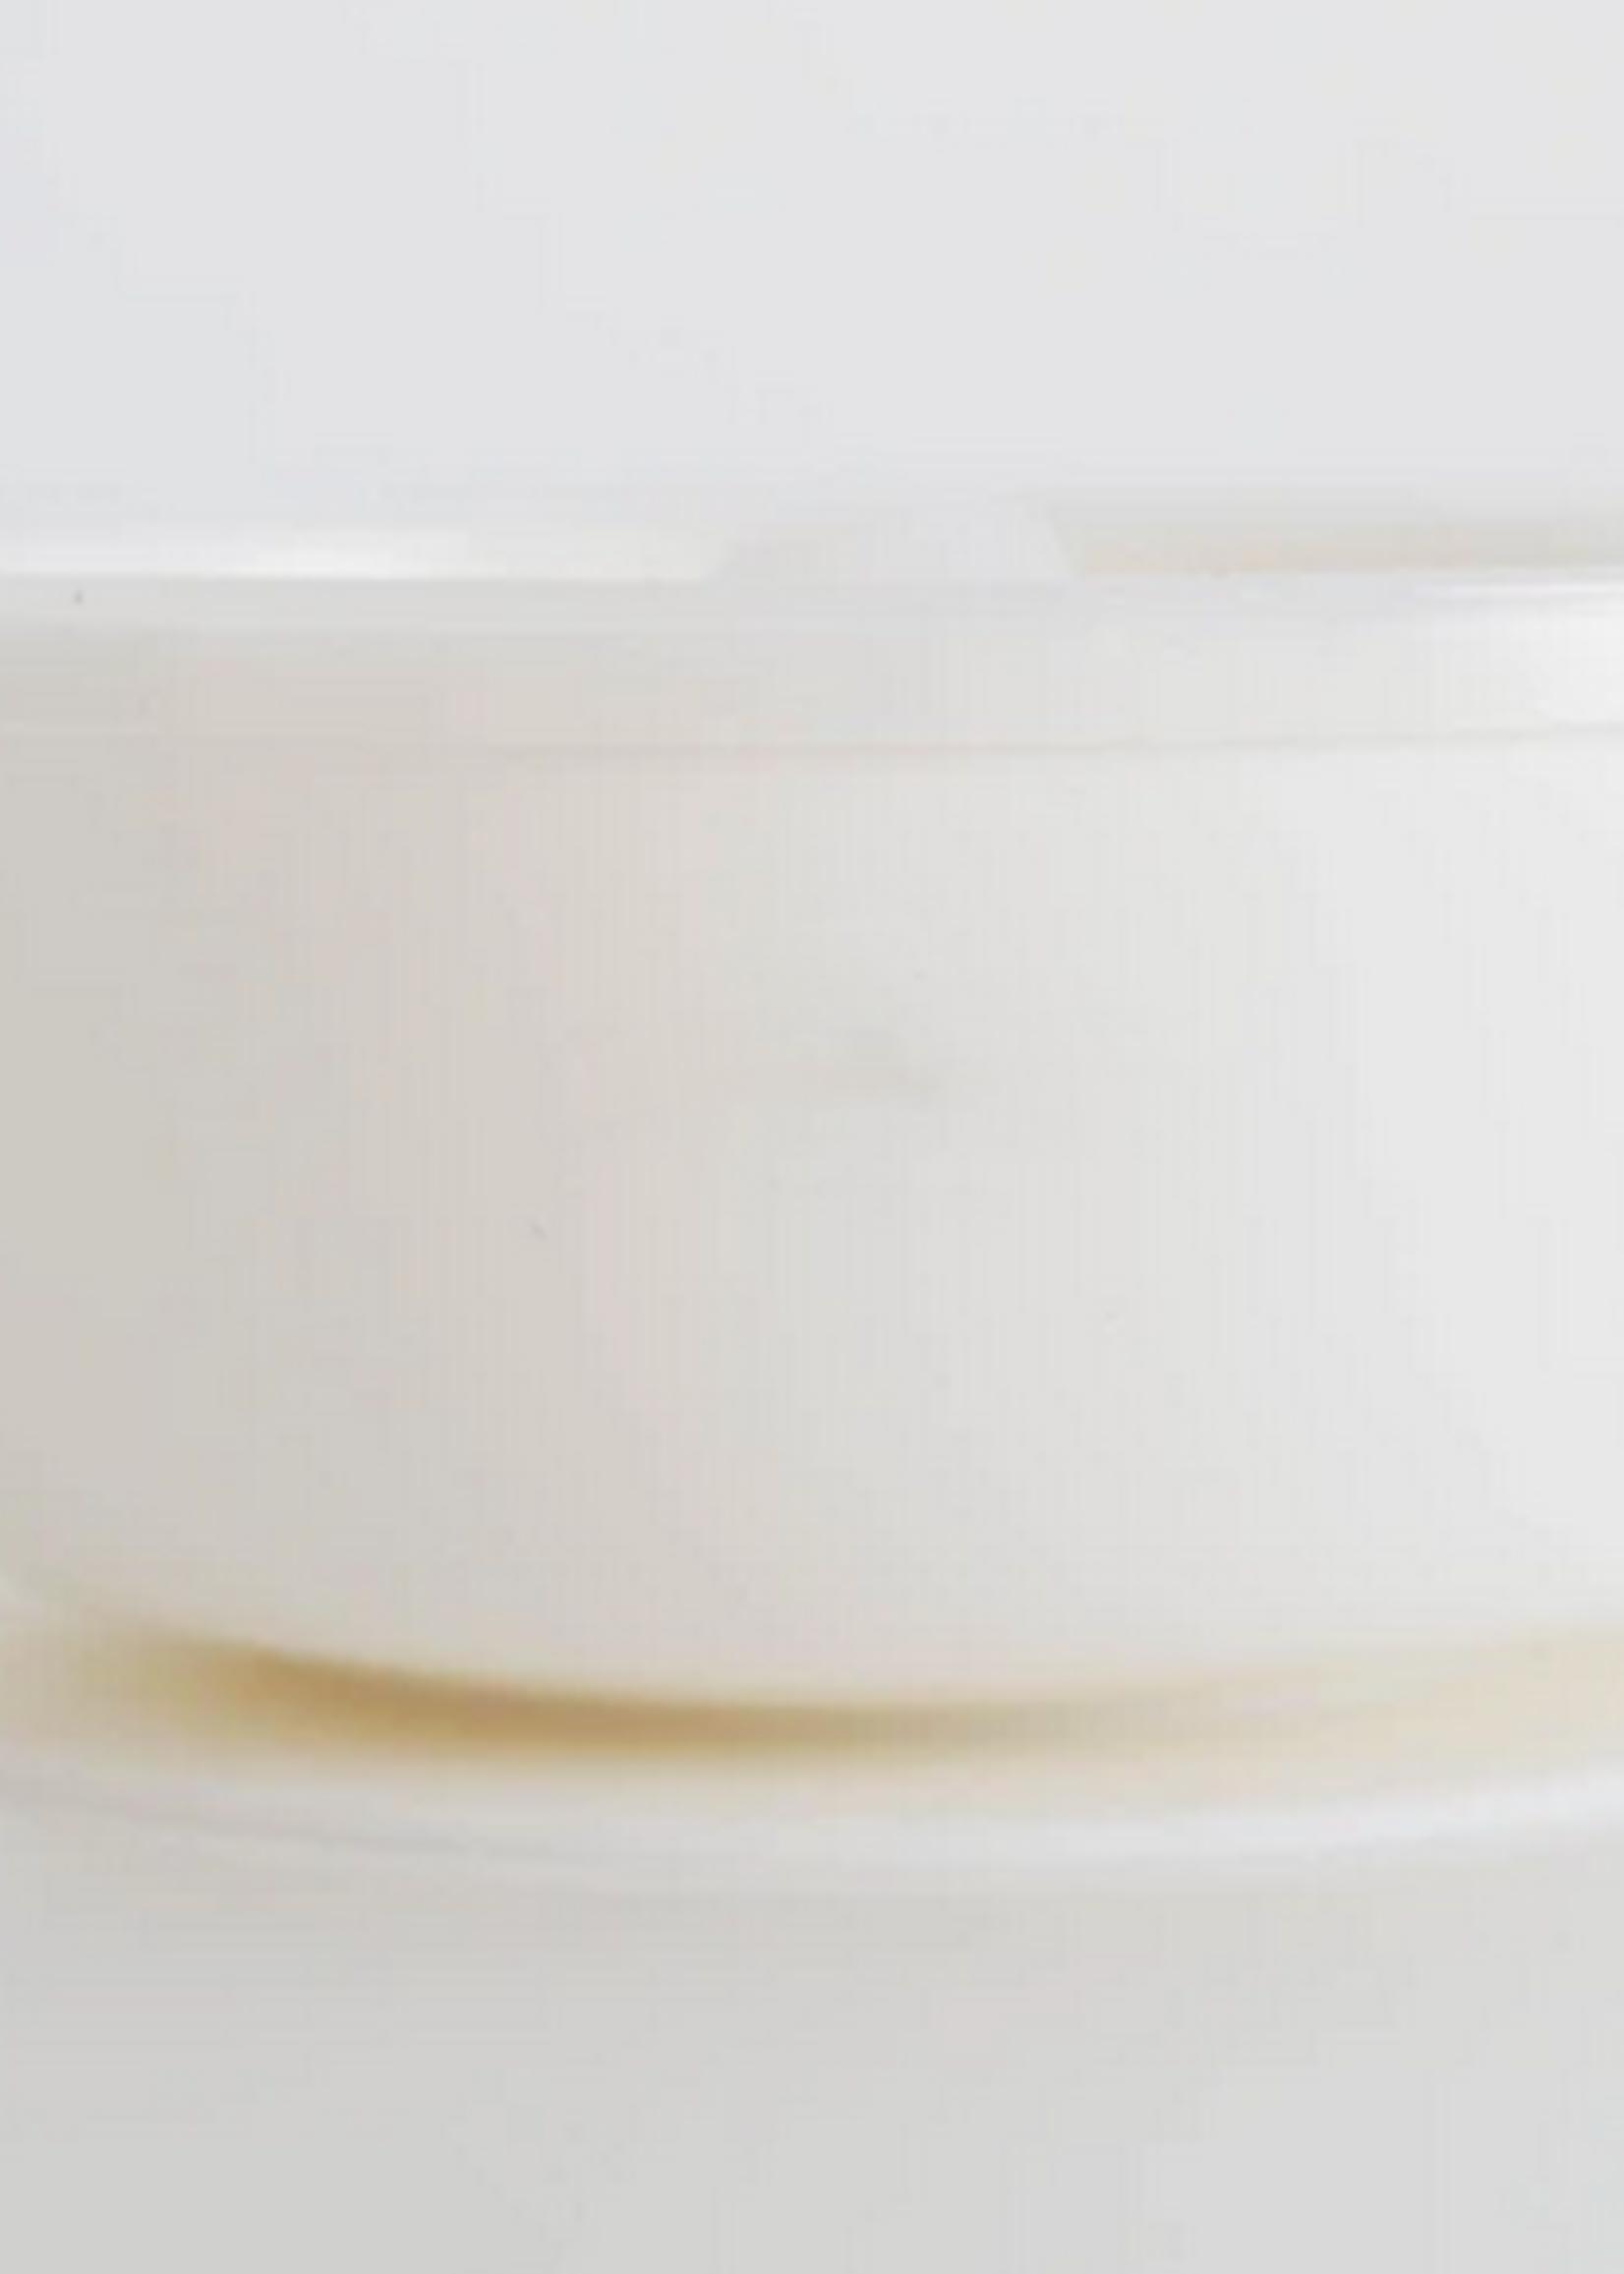 Elitaire Petite Cloud Suction Bowl with Lid